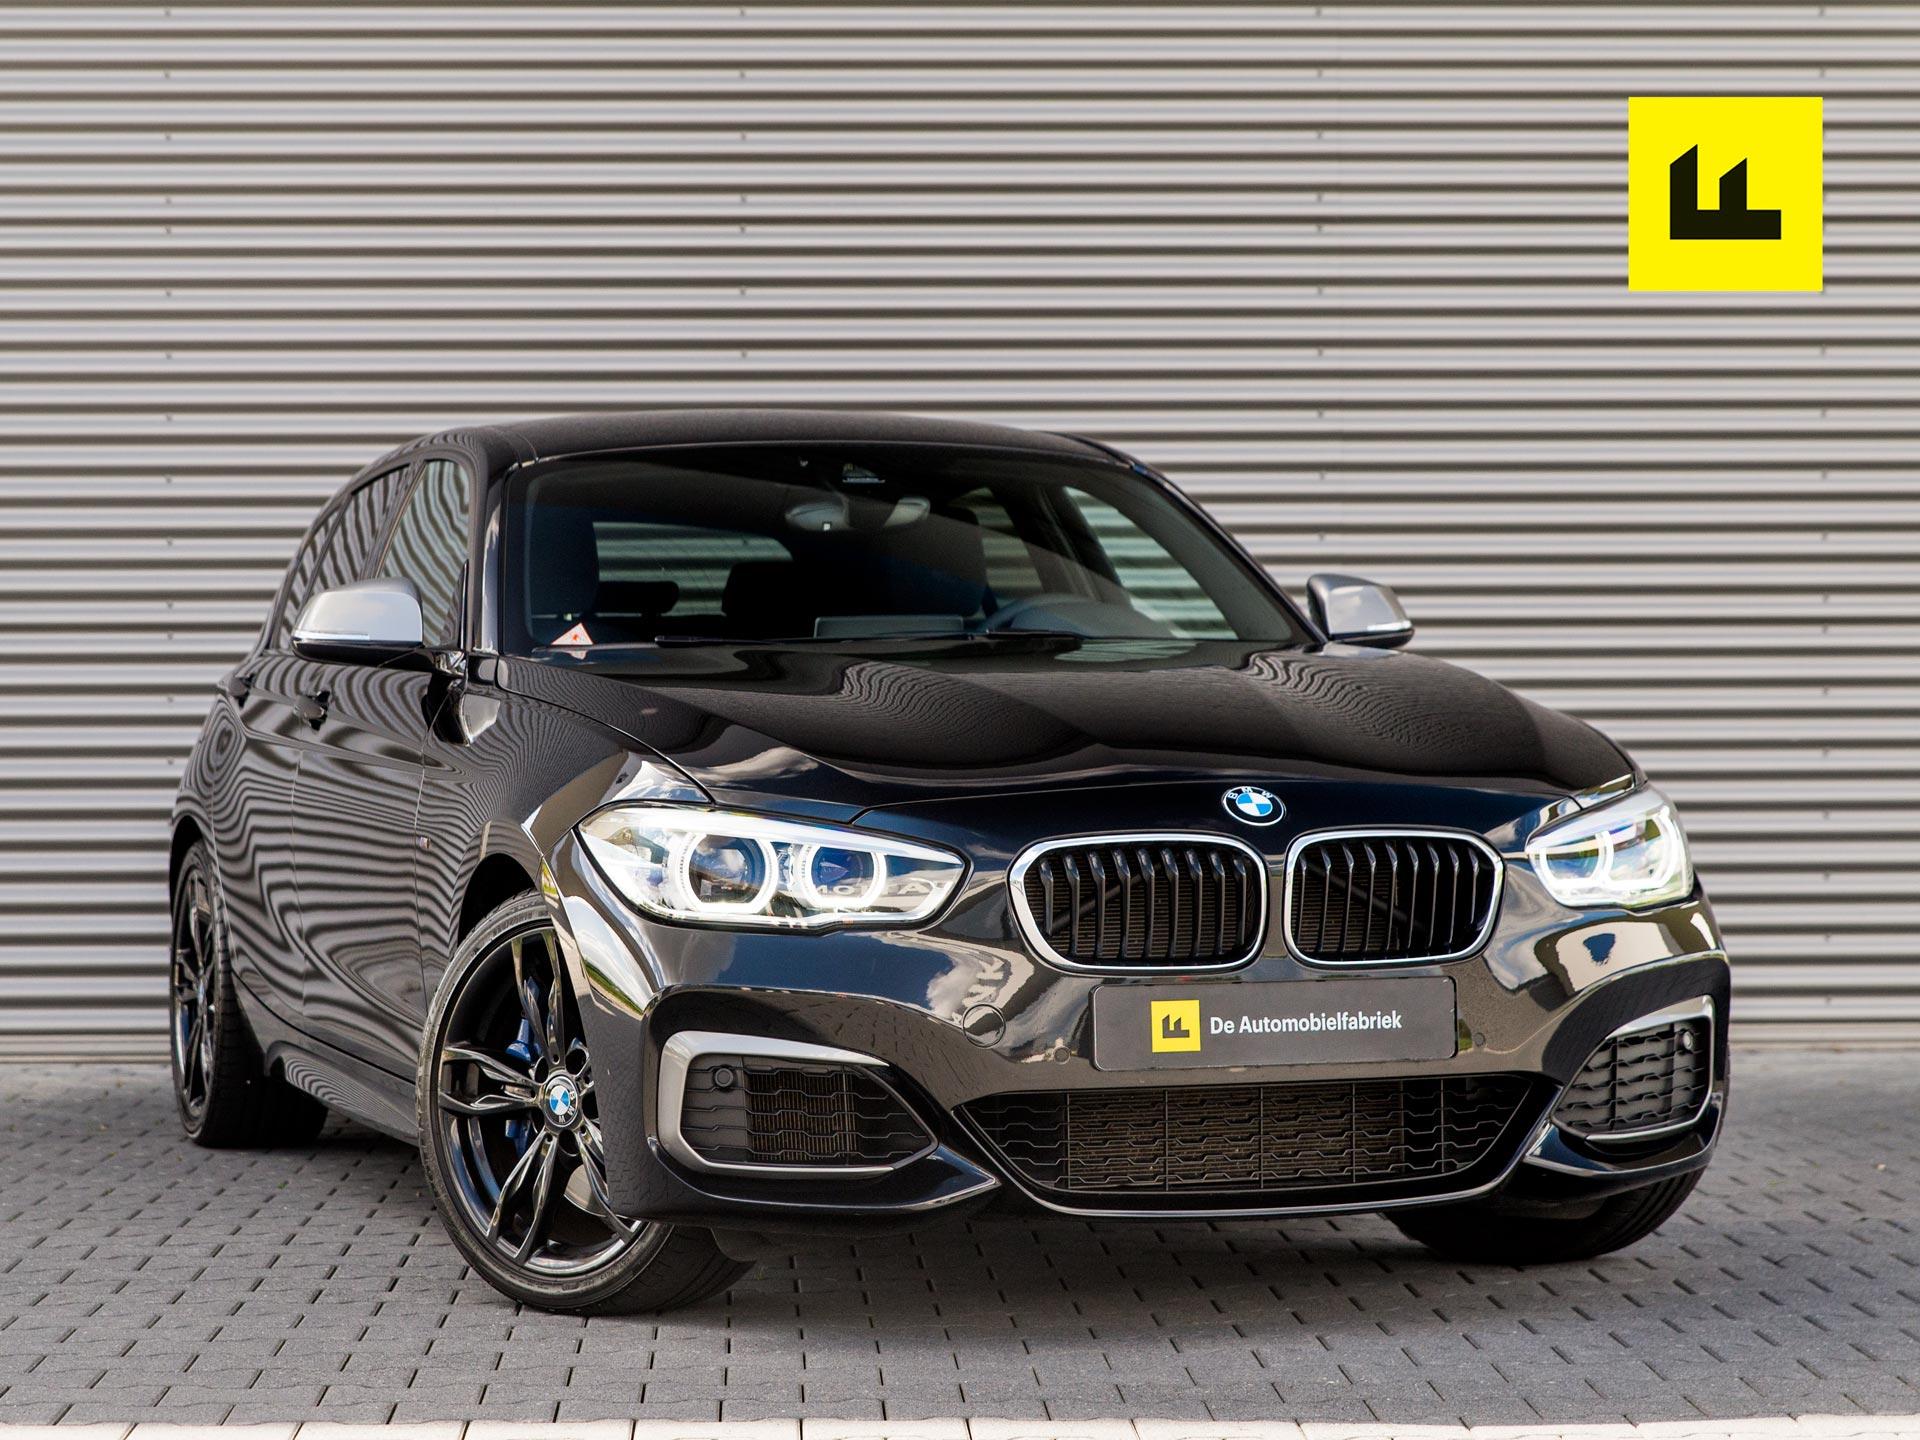 Tweedehands BMW M140i occasion